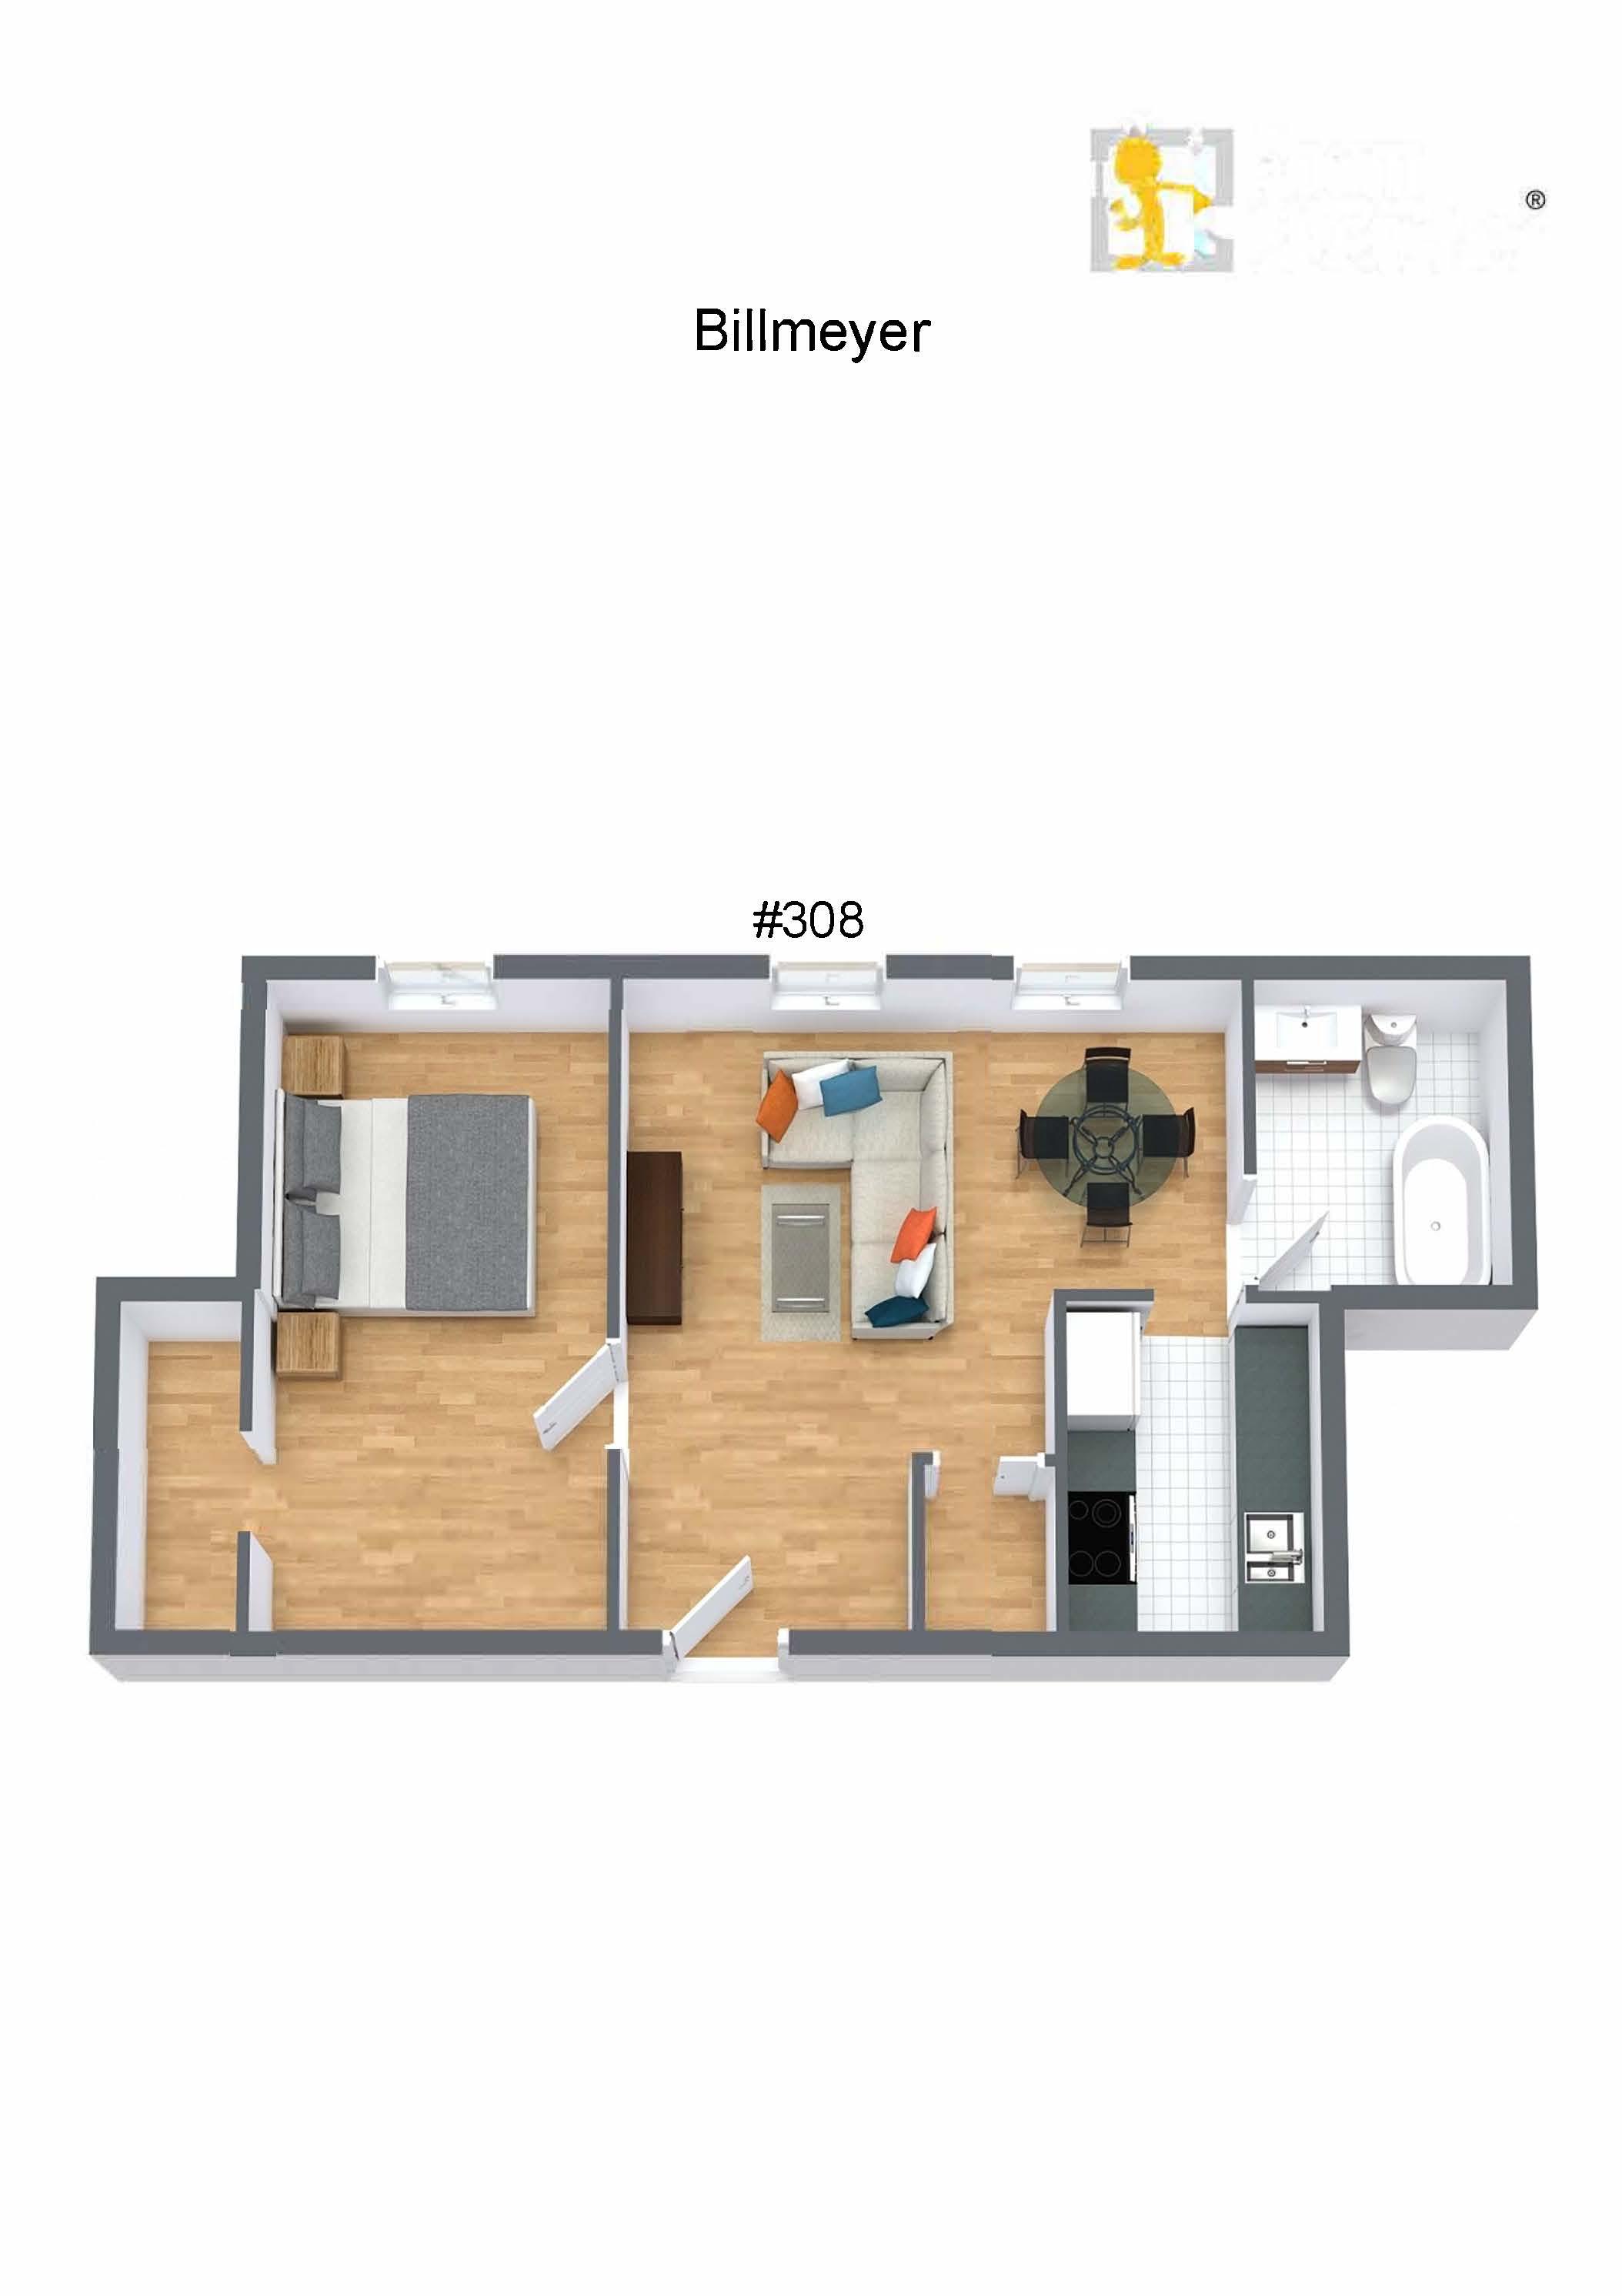 Billmeyer NEW - #308 - 3D Floor Plan.jpg